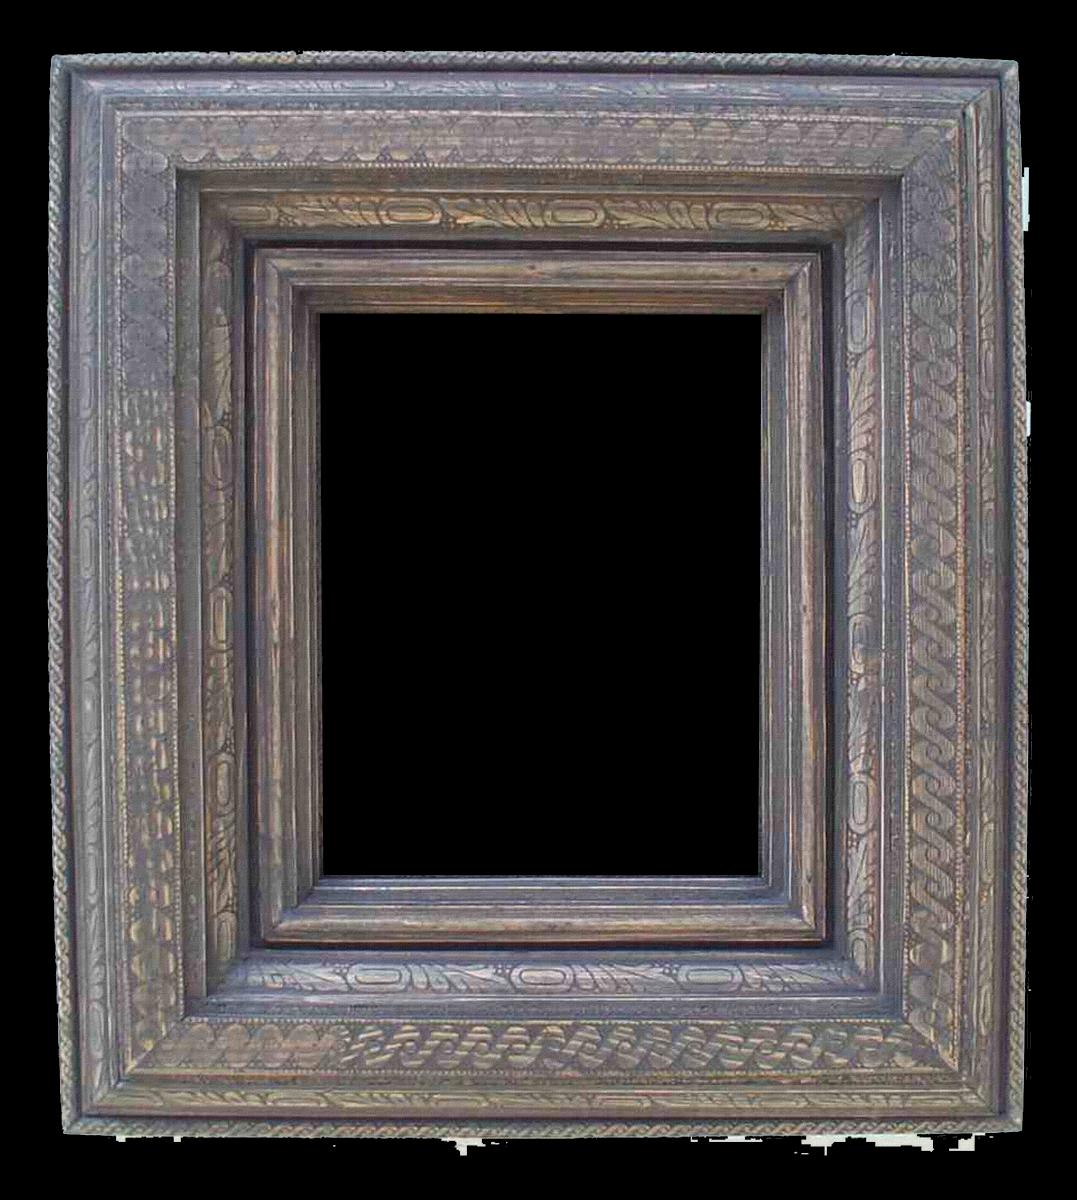 Marcos de madera en png gratis para tus fotos marcos gratis para fotograf as - Marcos de fotos madera ...